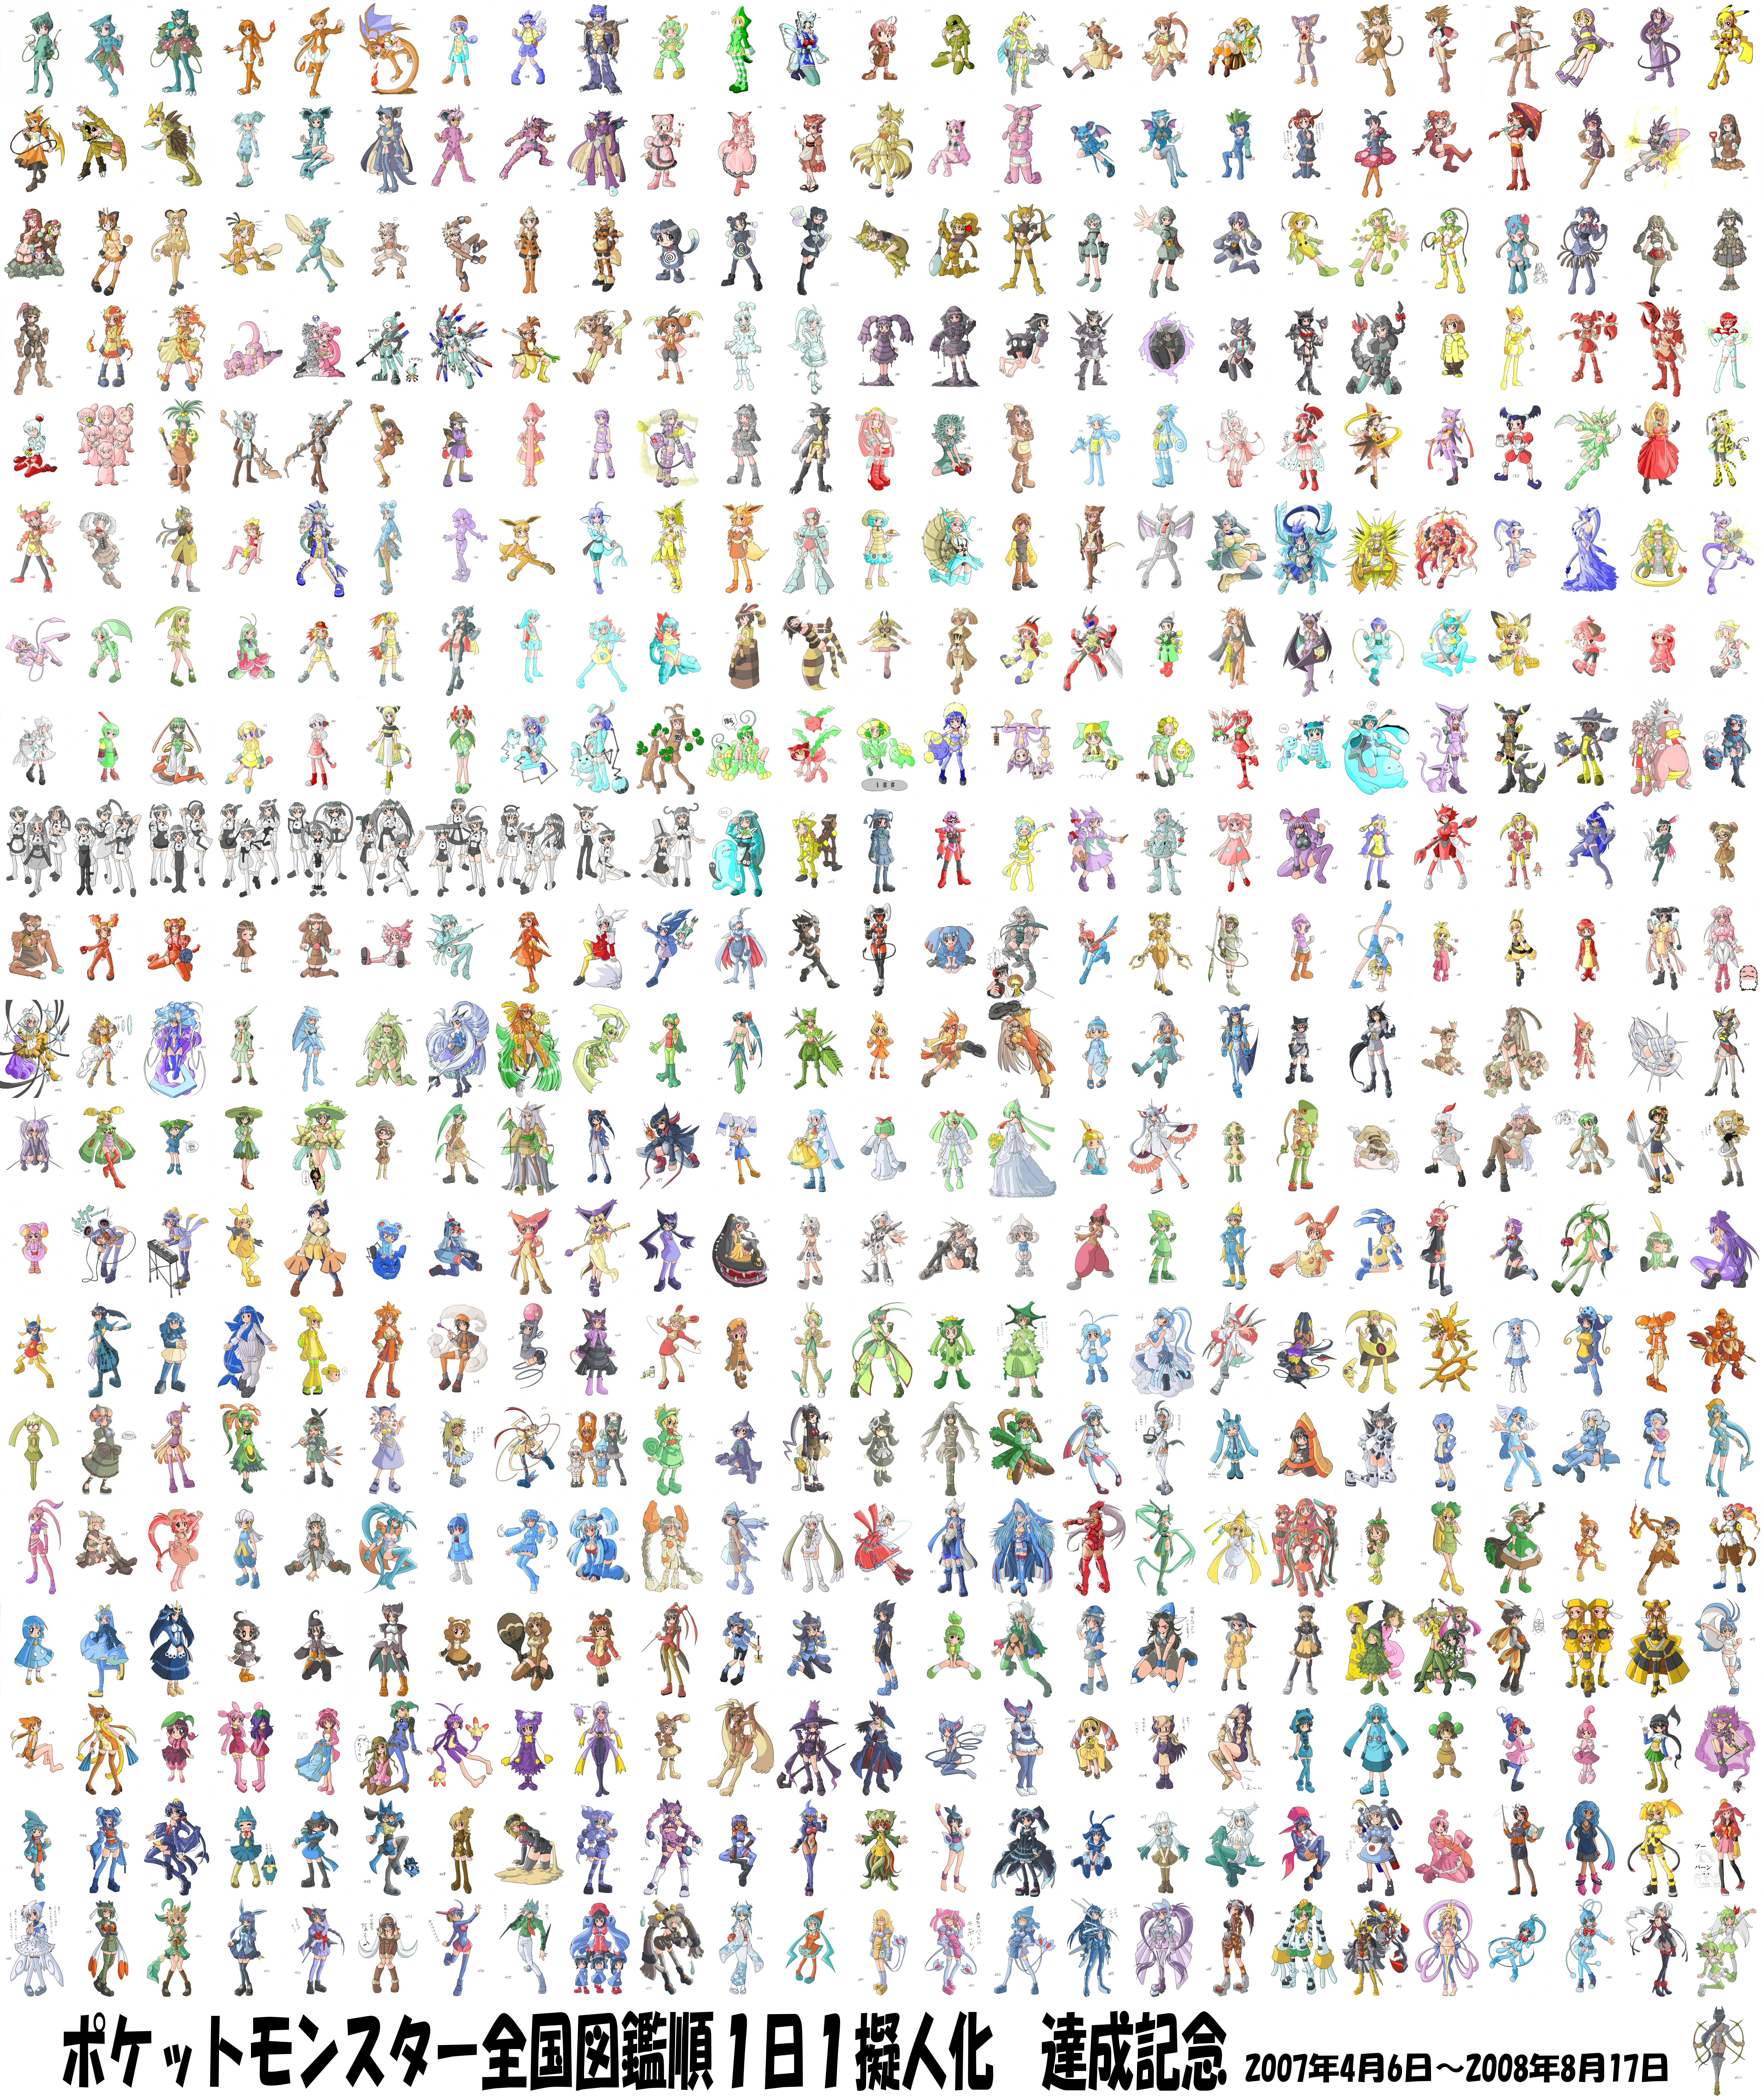 493 Pokemon in human form | Pokémon | Know Your Meme